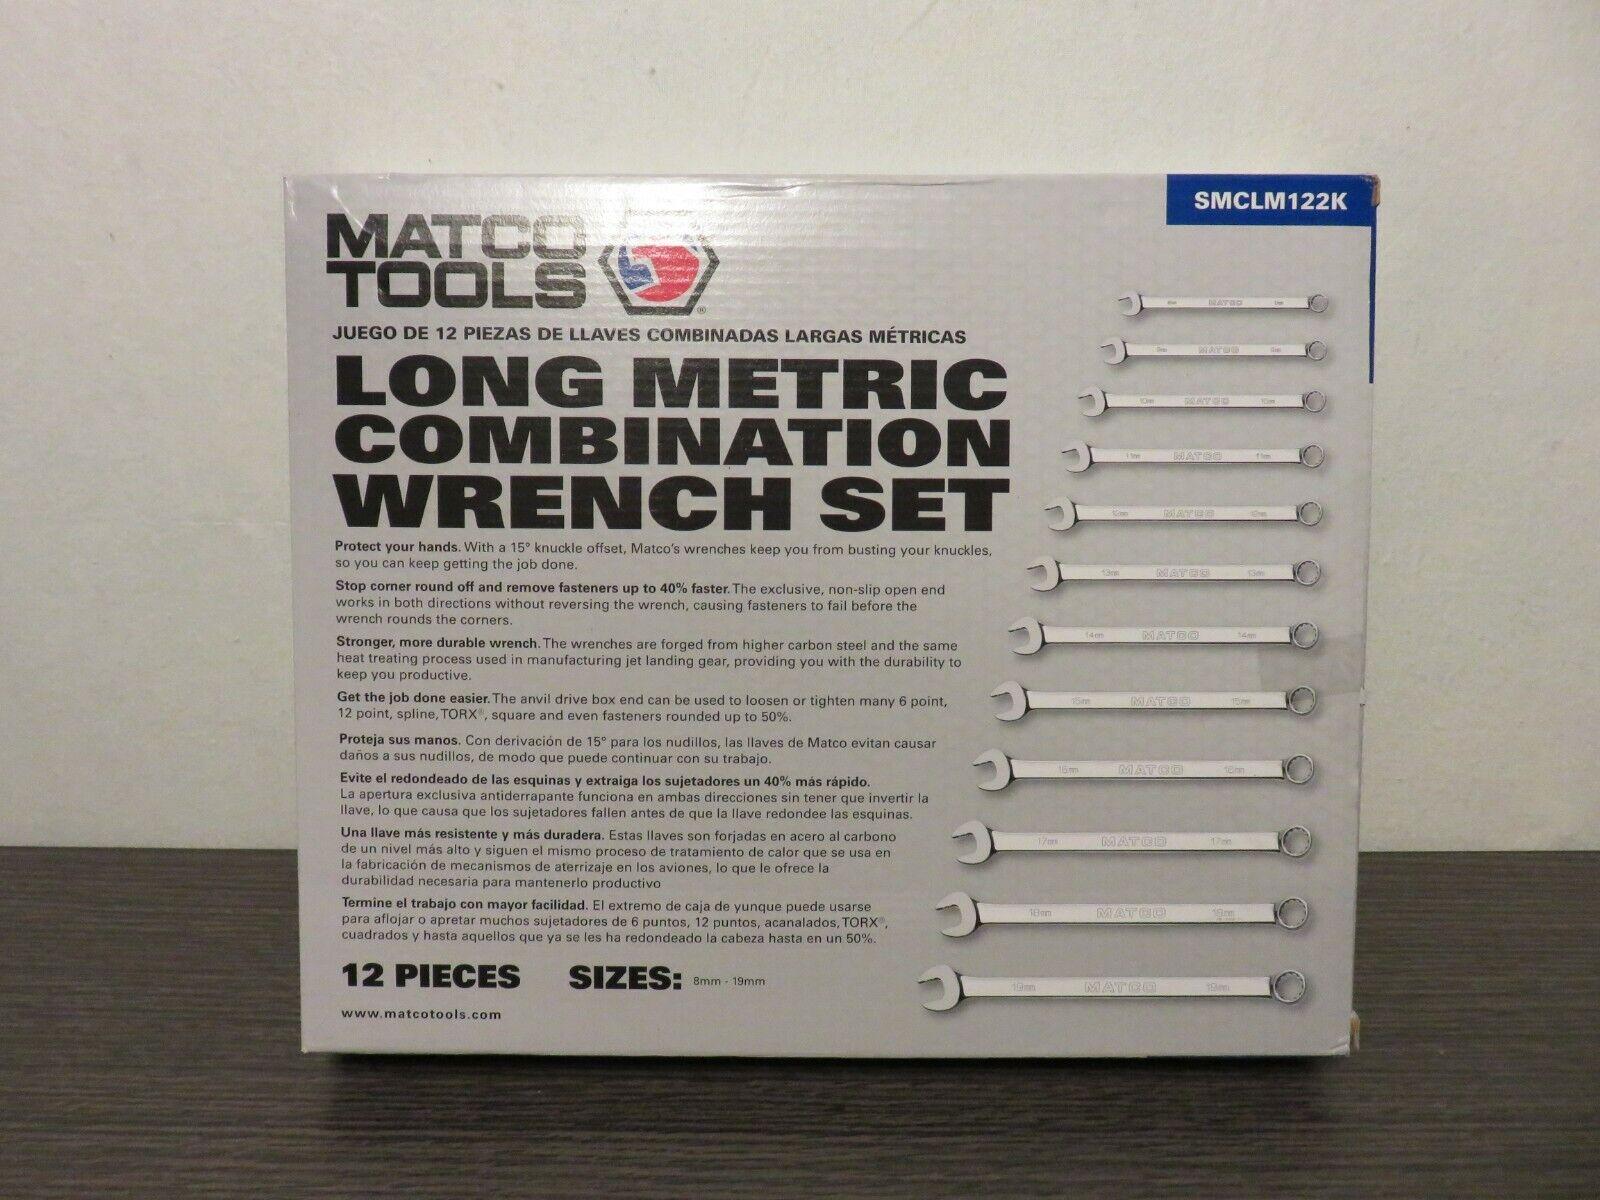 Britool Hallmark 12 Piece Combination Wrench Set Metric 8-19mm CELMSET12